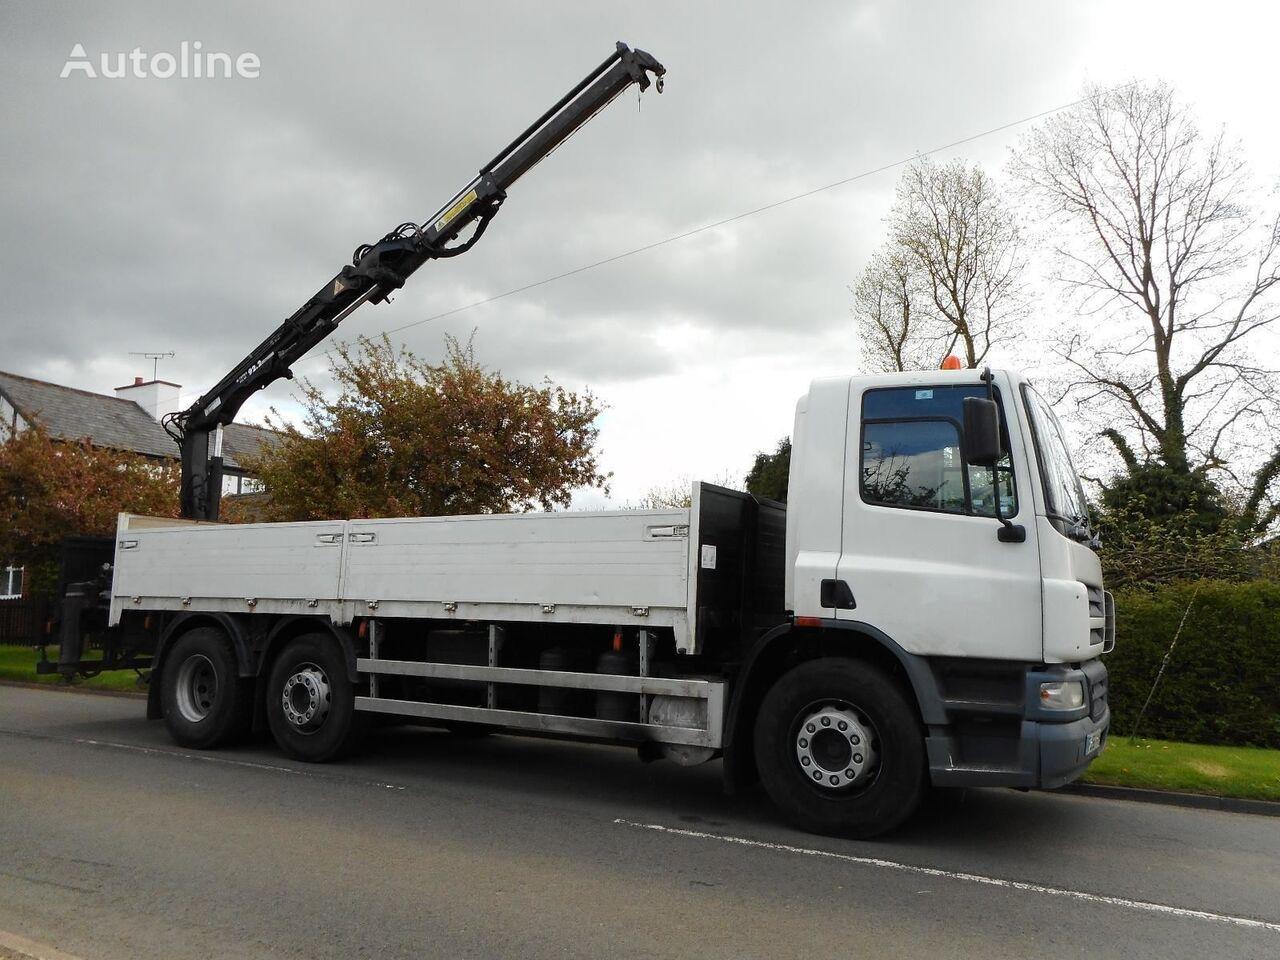 DAF CF 75 310 flatbed truck